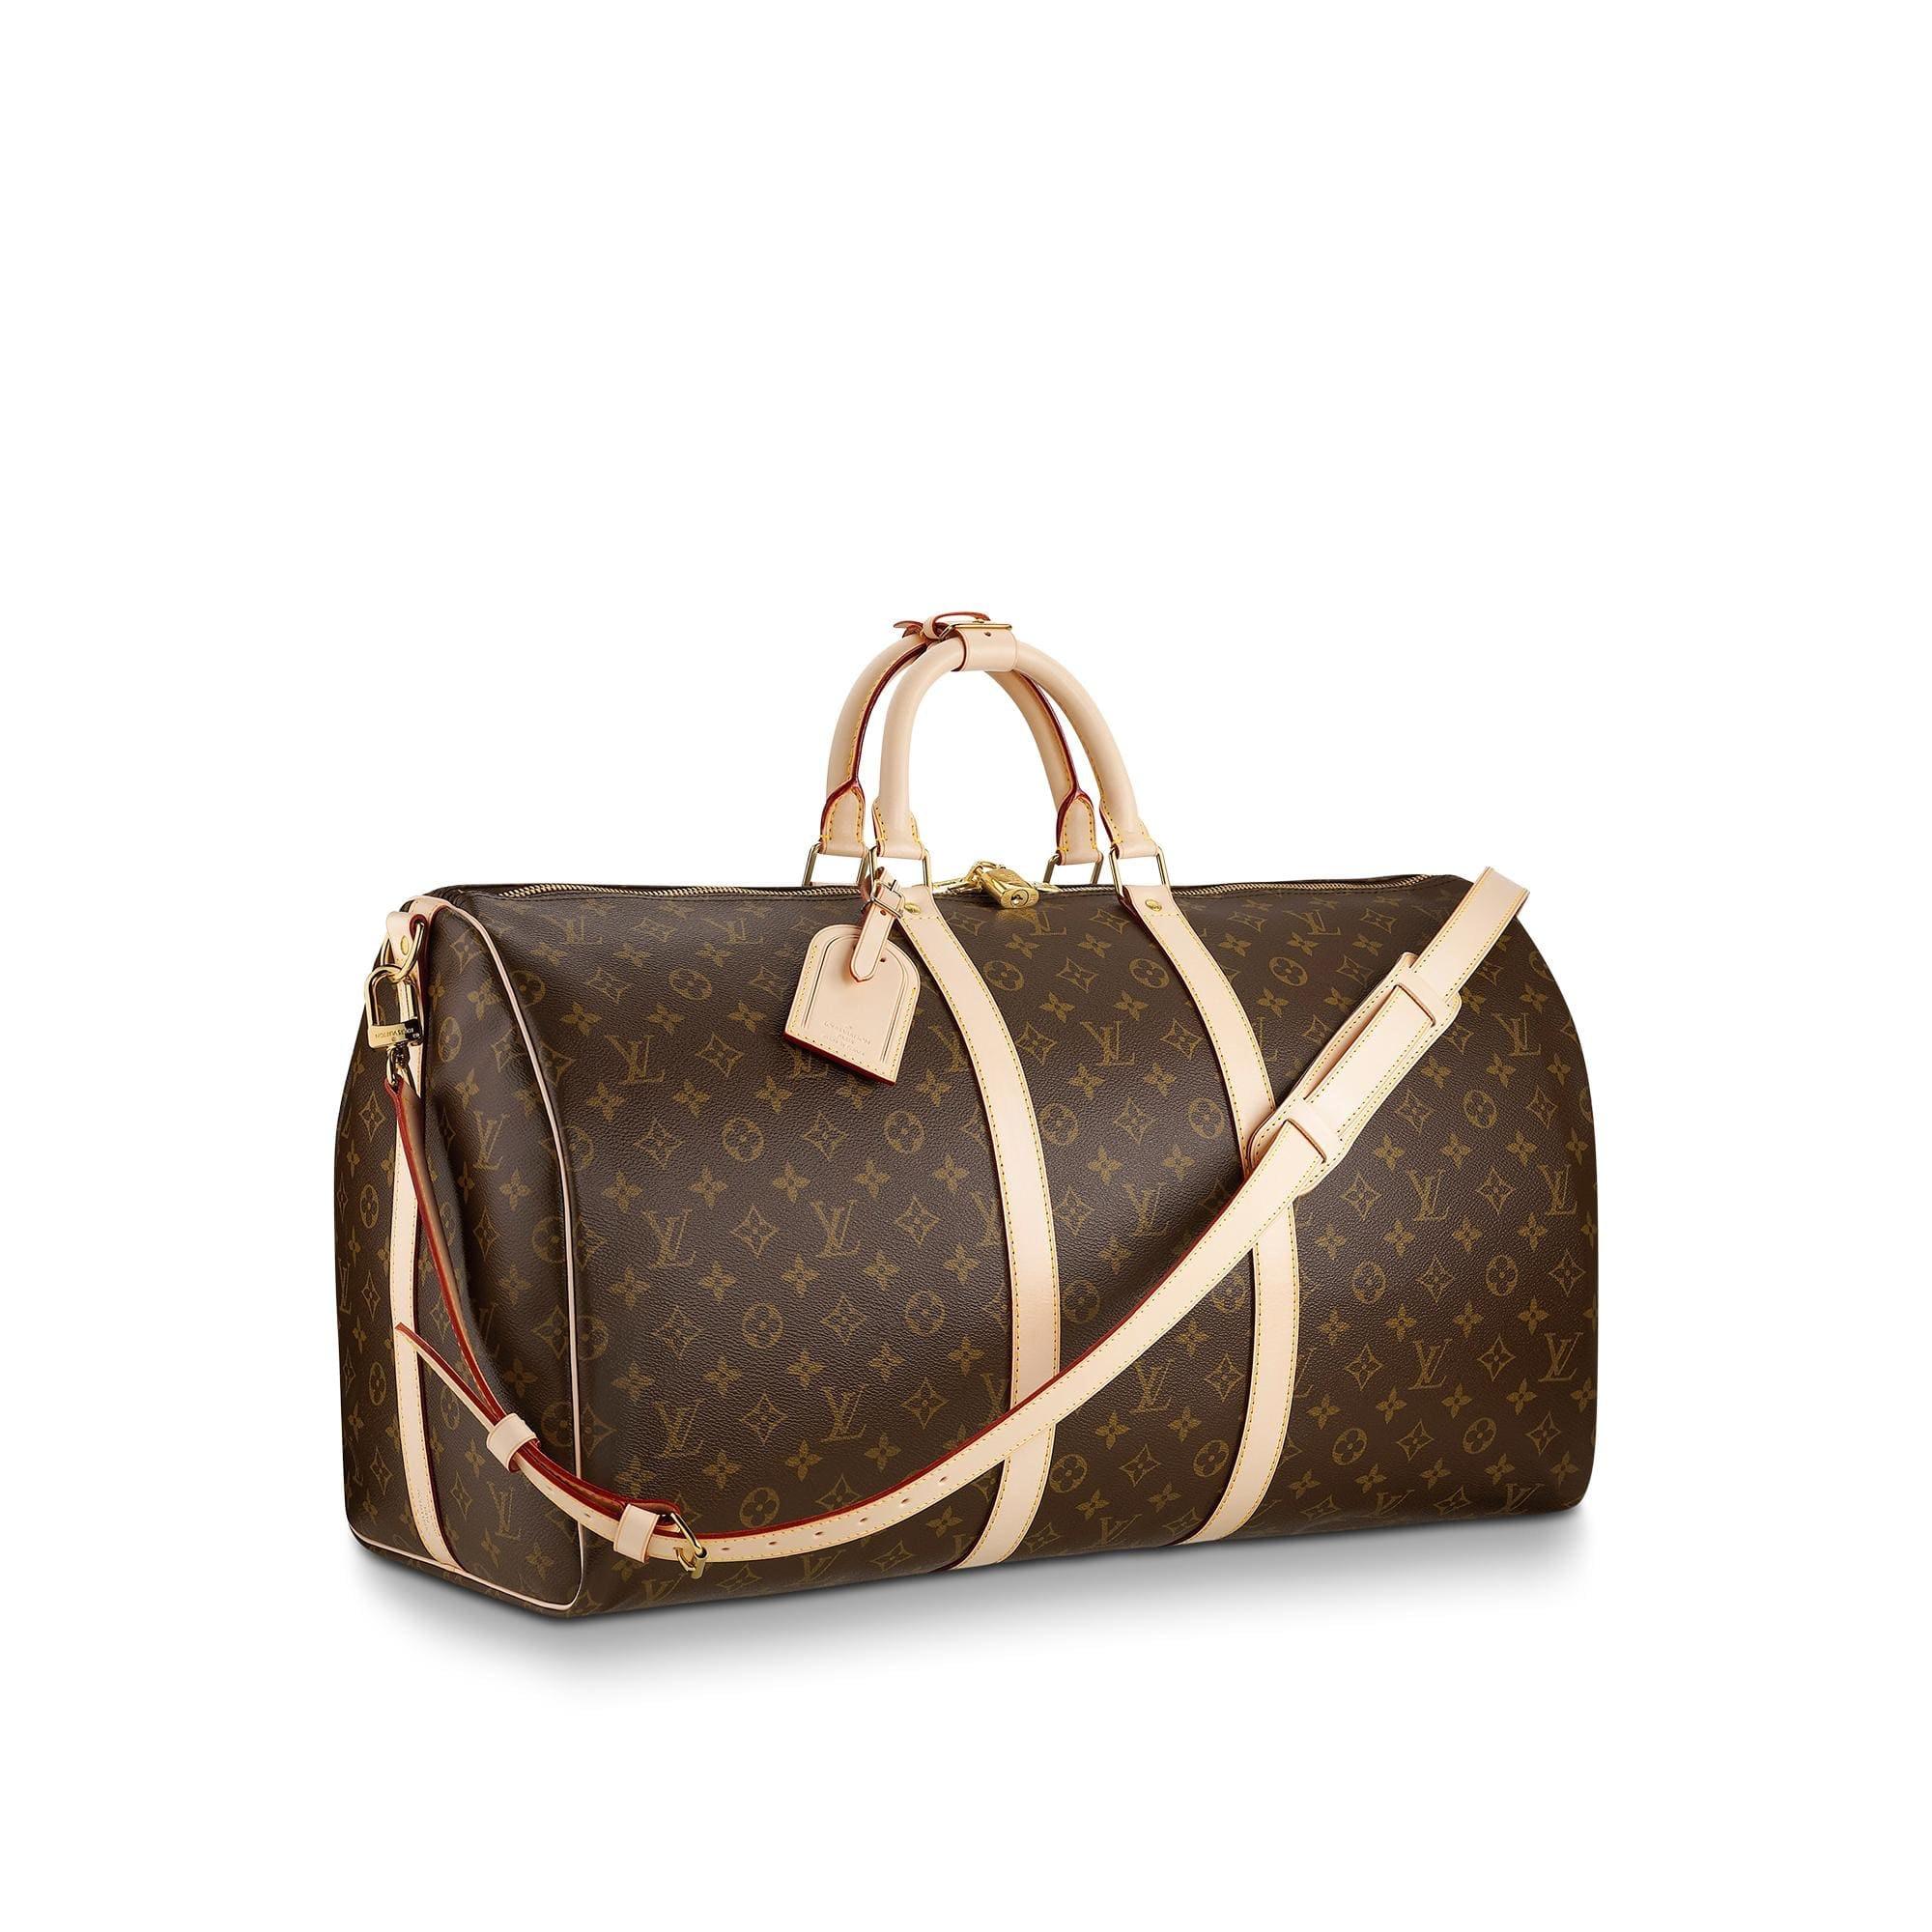 Louis Vuitton Keepall Bandouliere Monogram 55 Brown